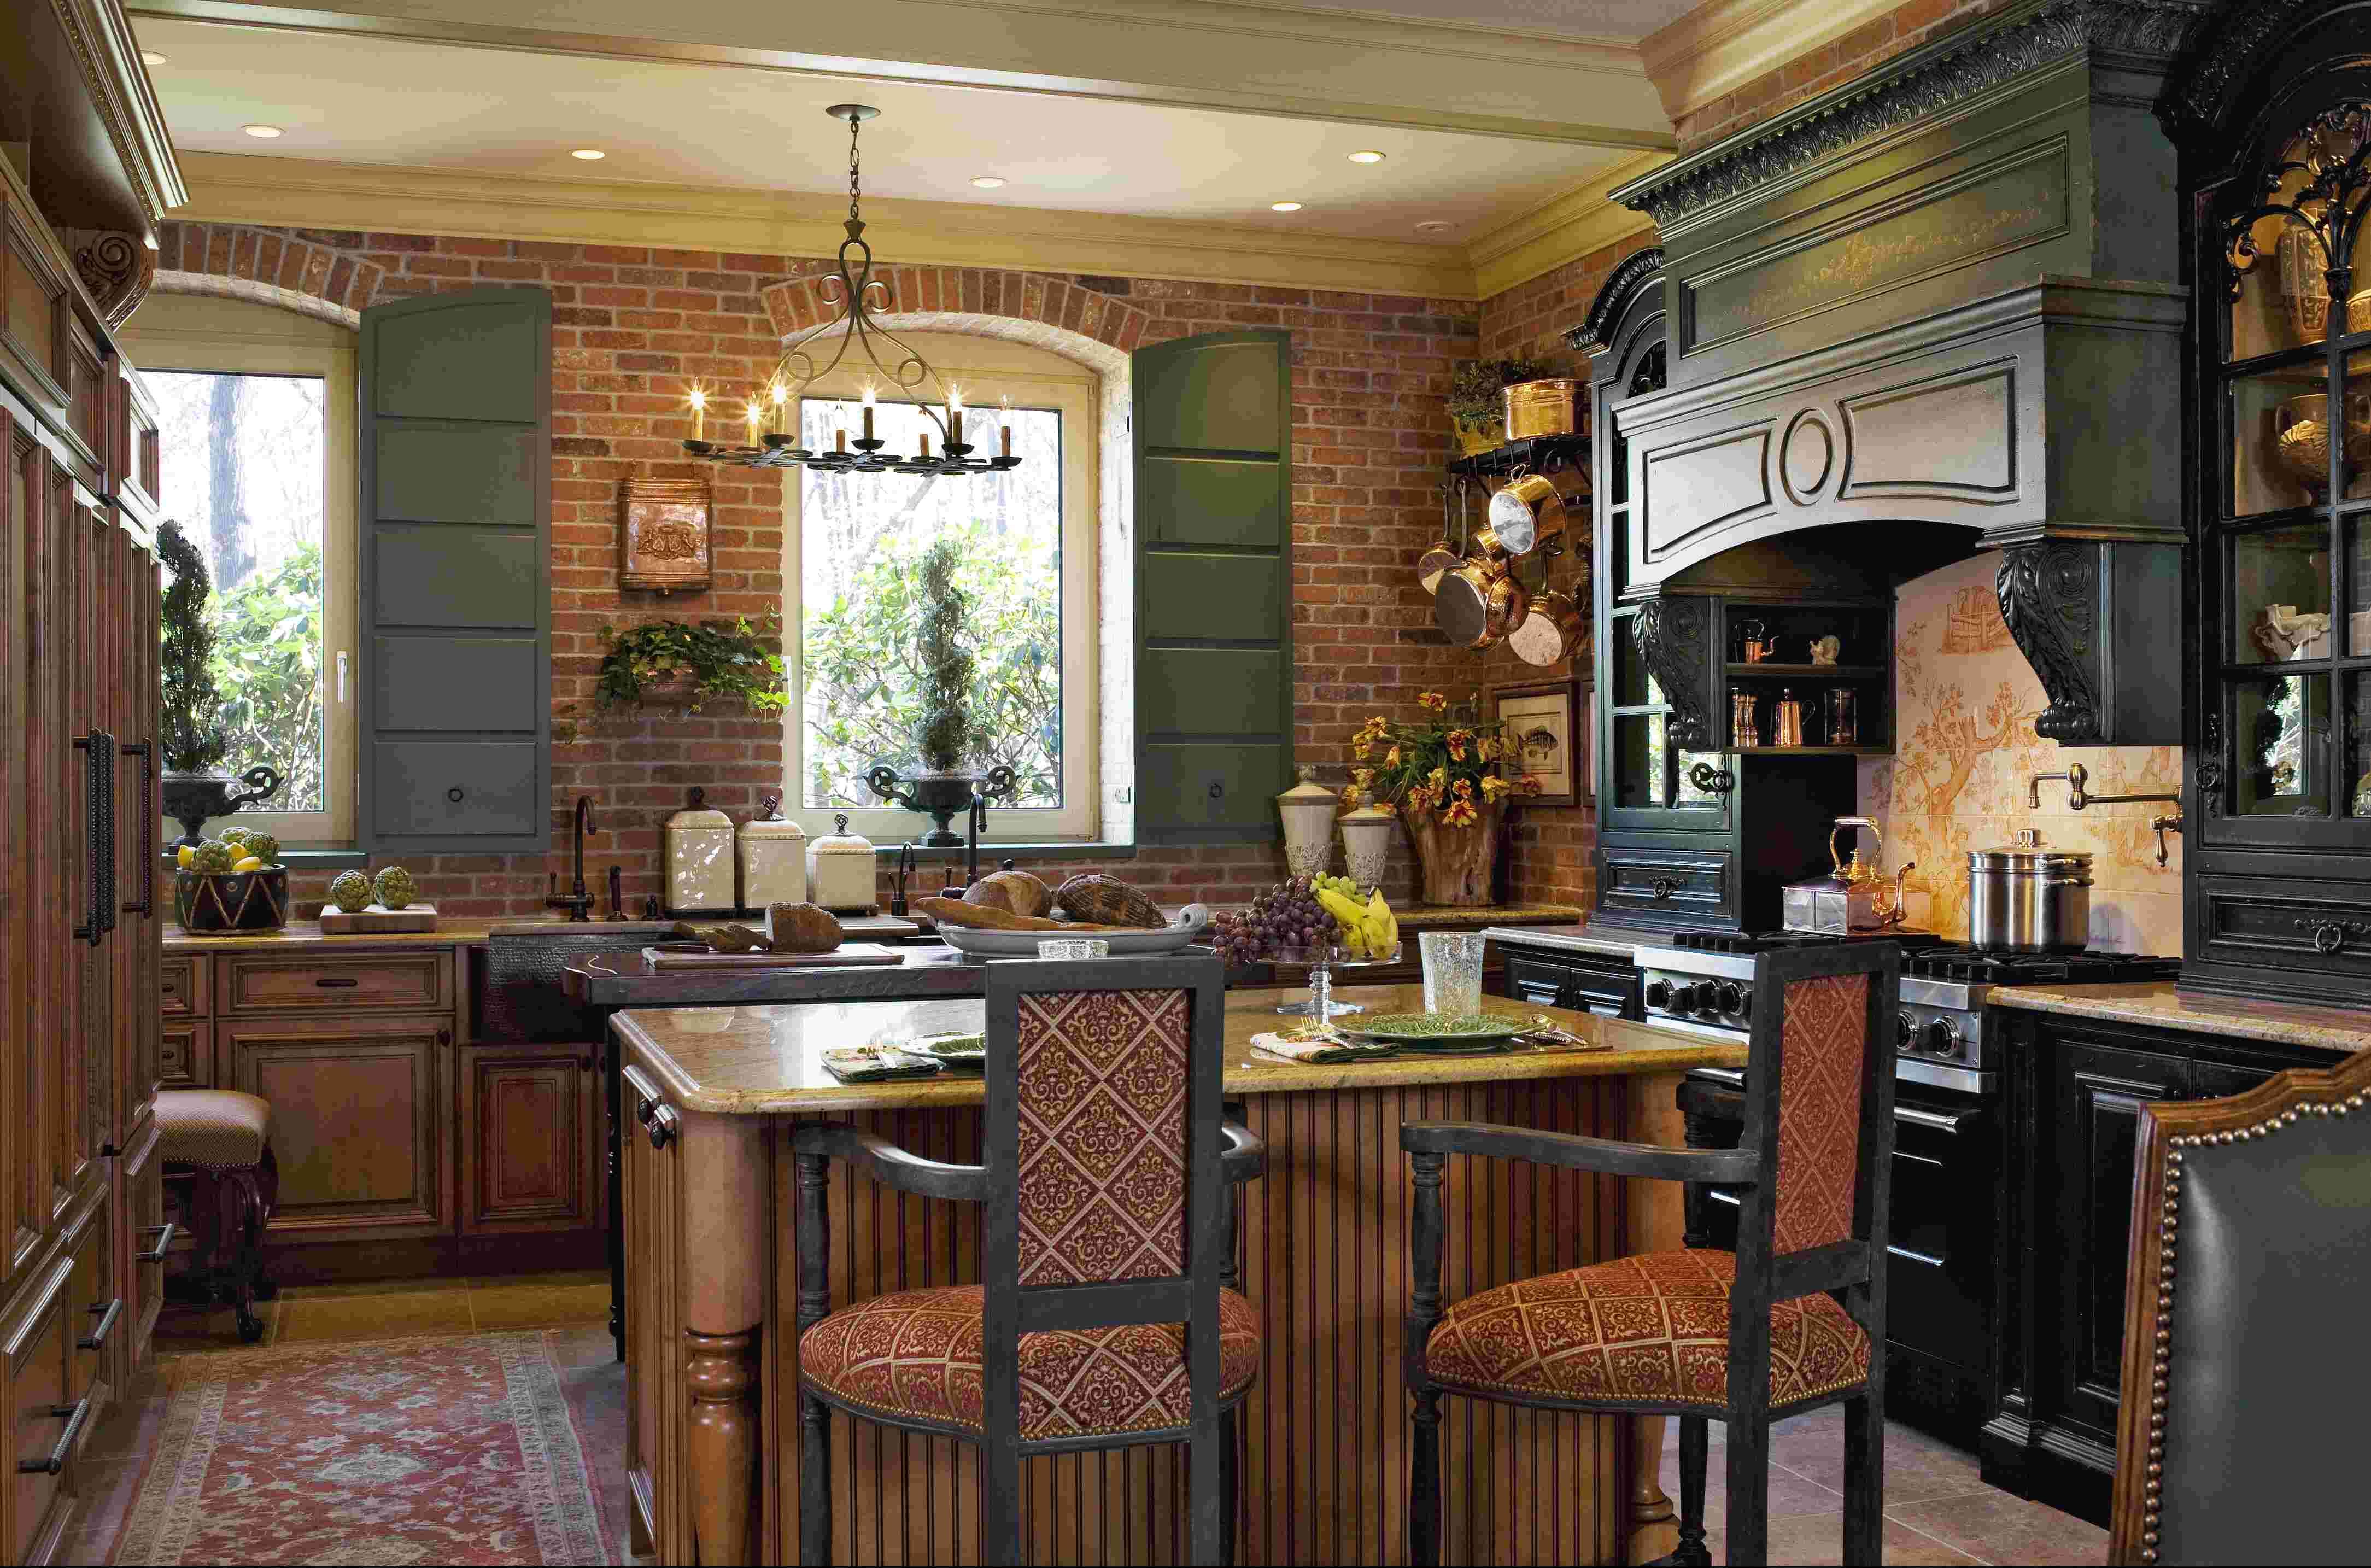 Wilson Kelsey Design Awarded 2016 Best Of North Shore For Traditional Interior Design